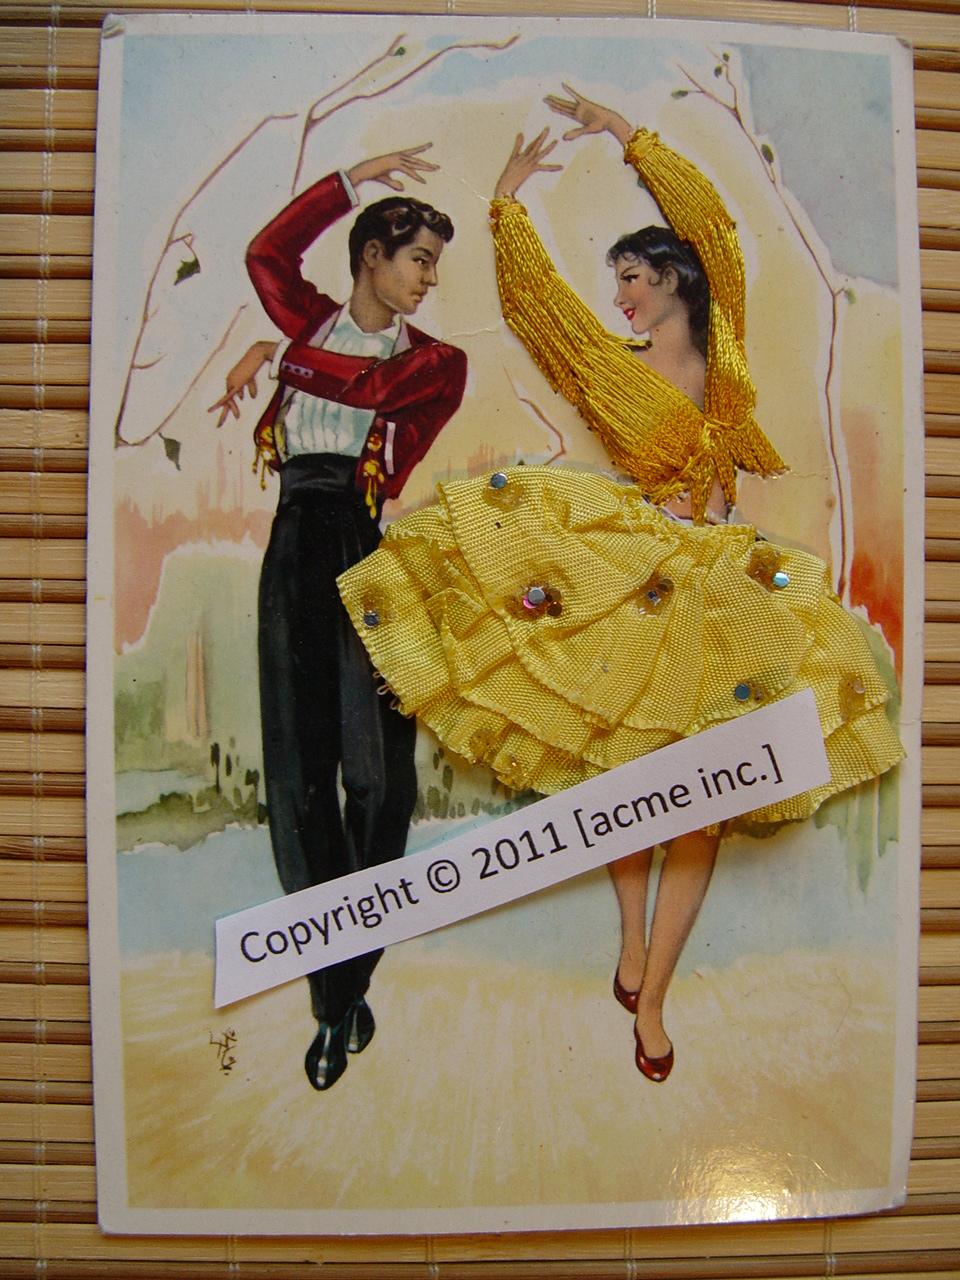 http://www.acme-inc.co.uk/greetingscards/DSC05445.jpg